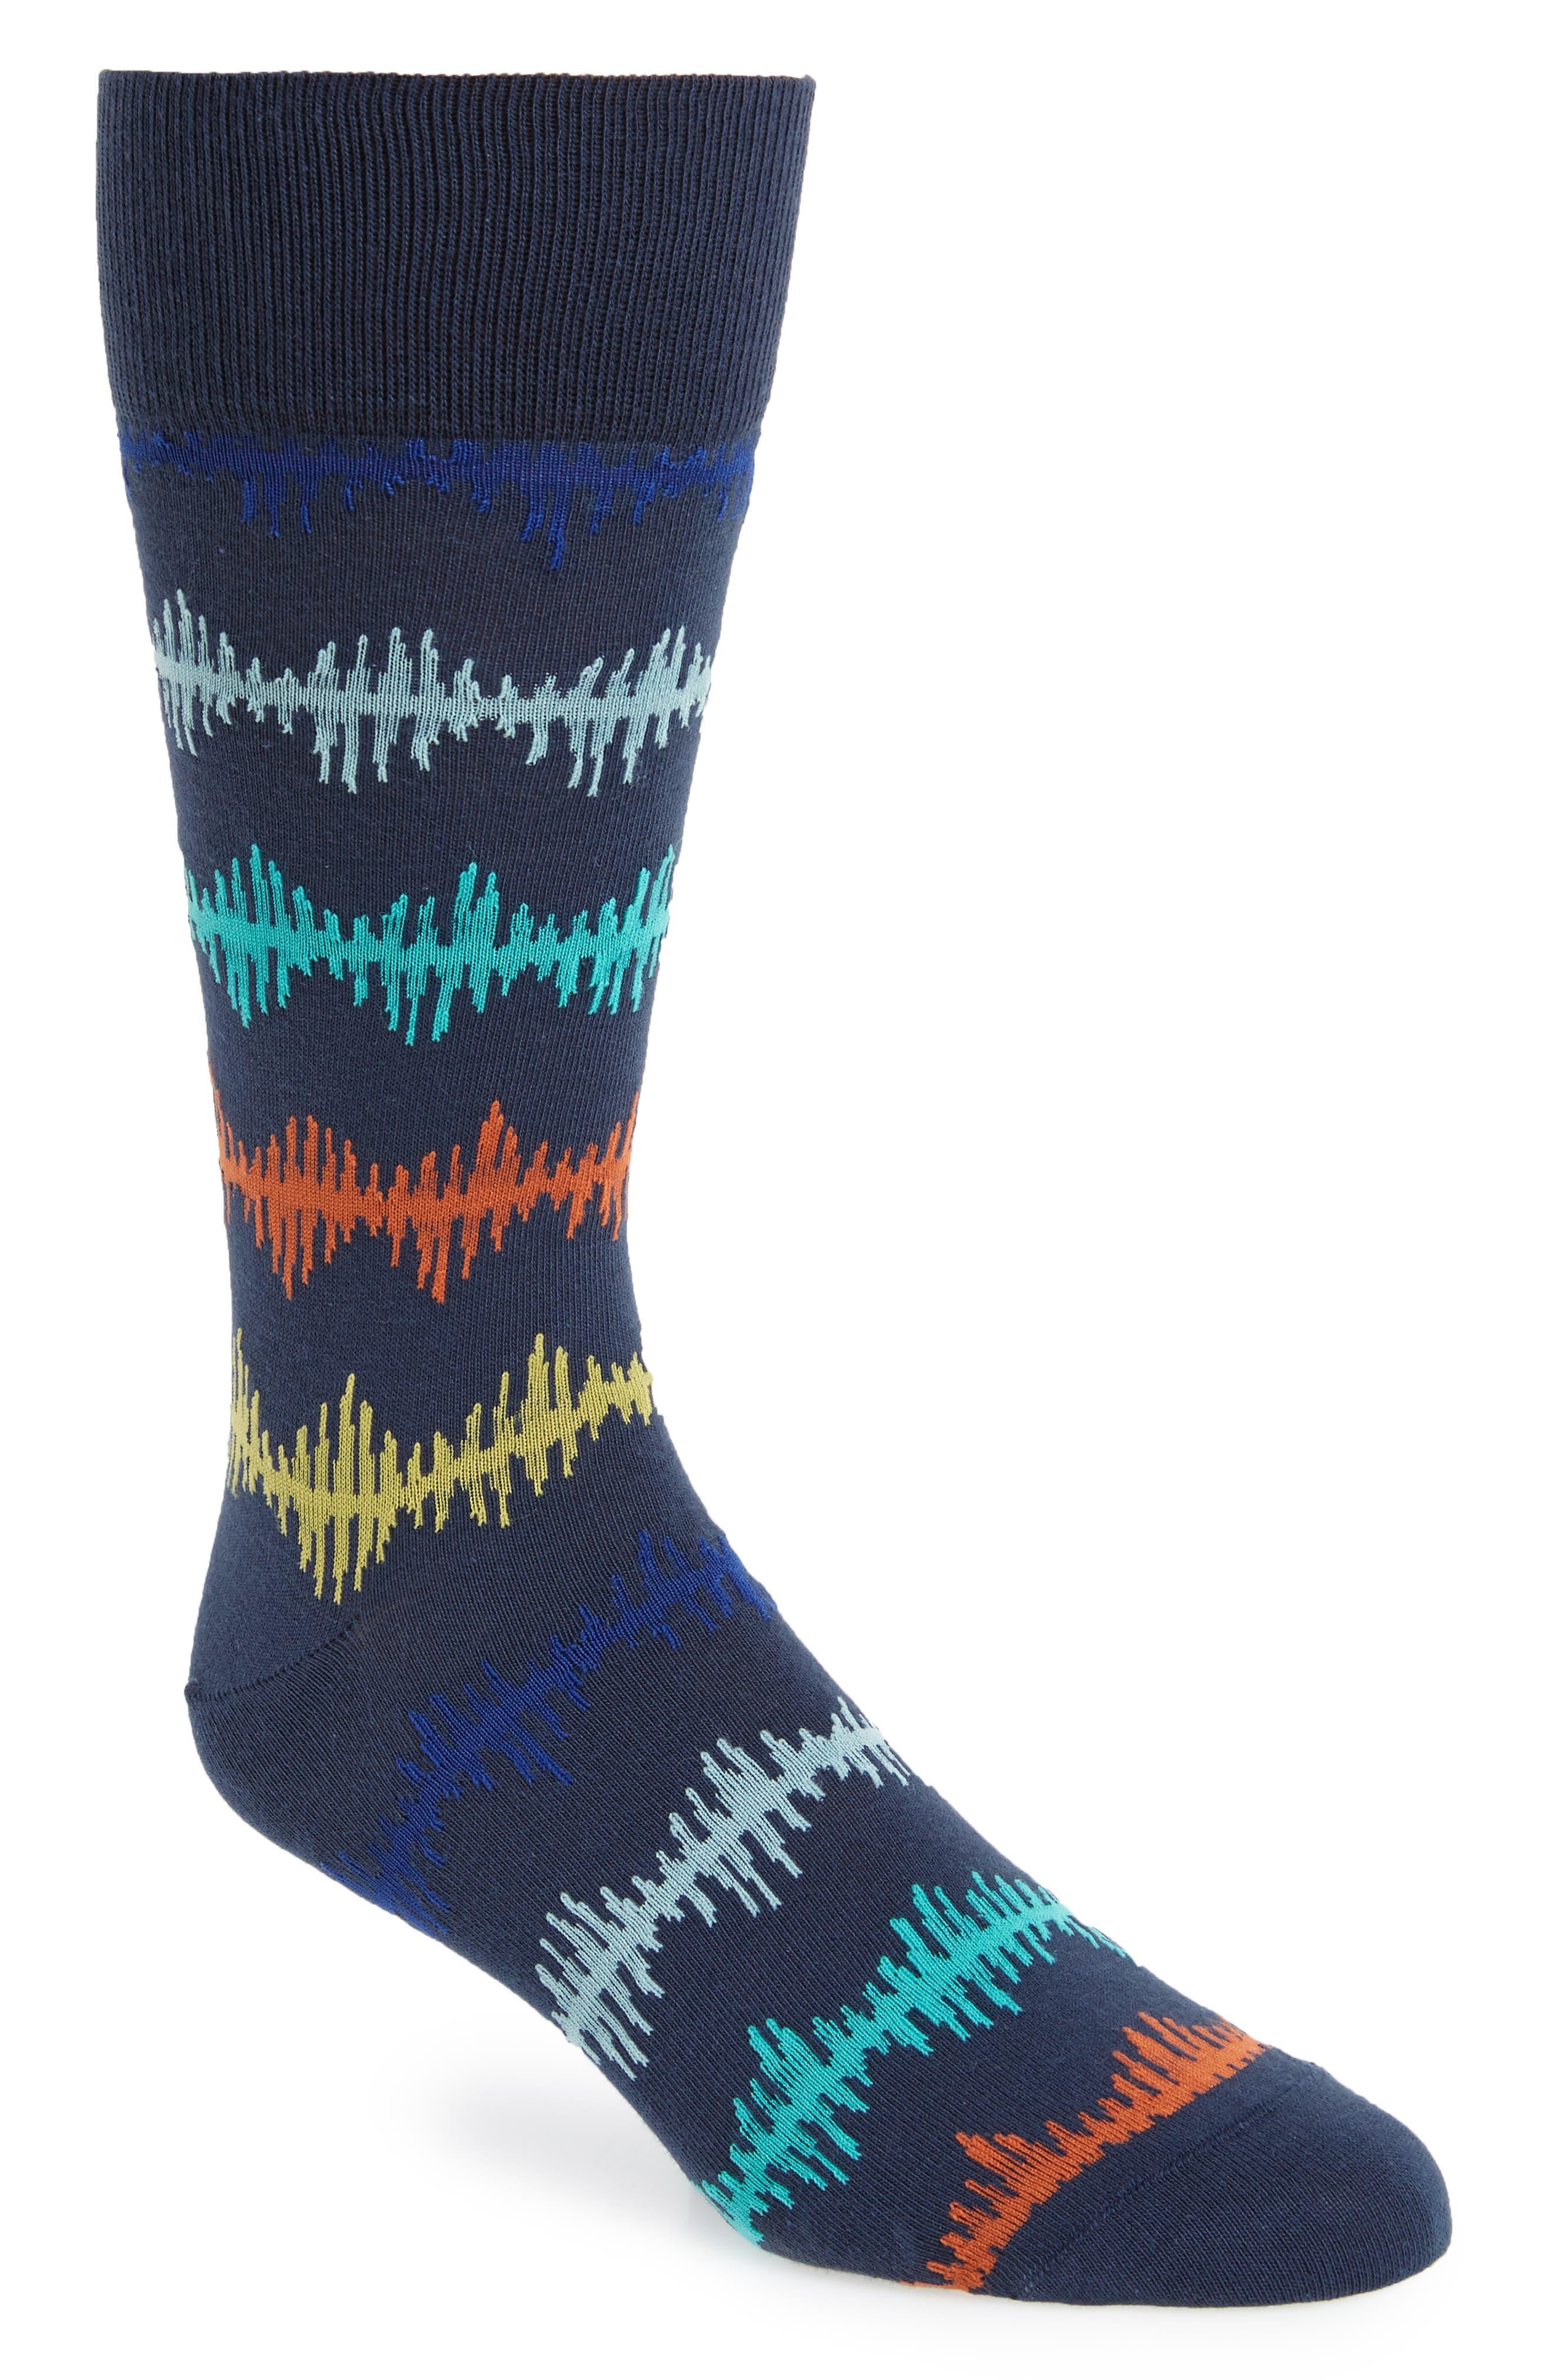 Pulse Wave Socks,                             Main thumbnail 1, color,                             Navy/ Orange